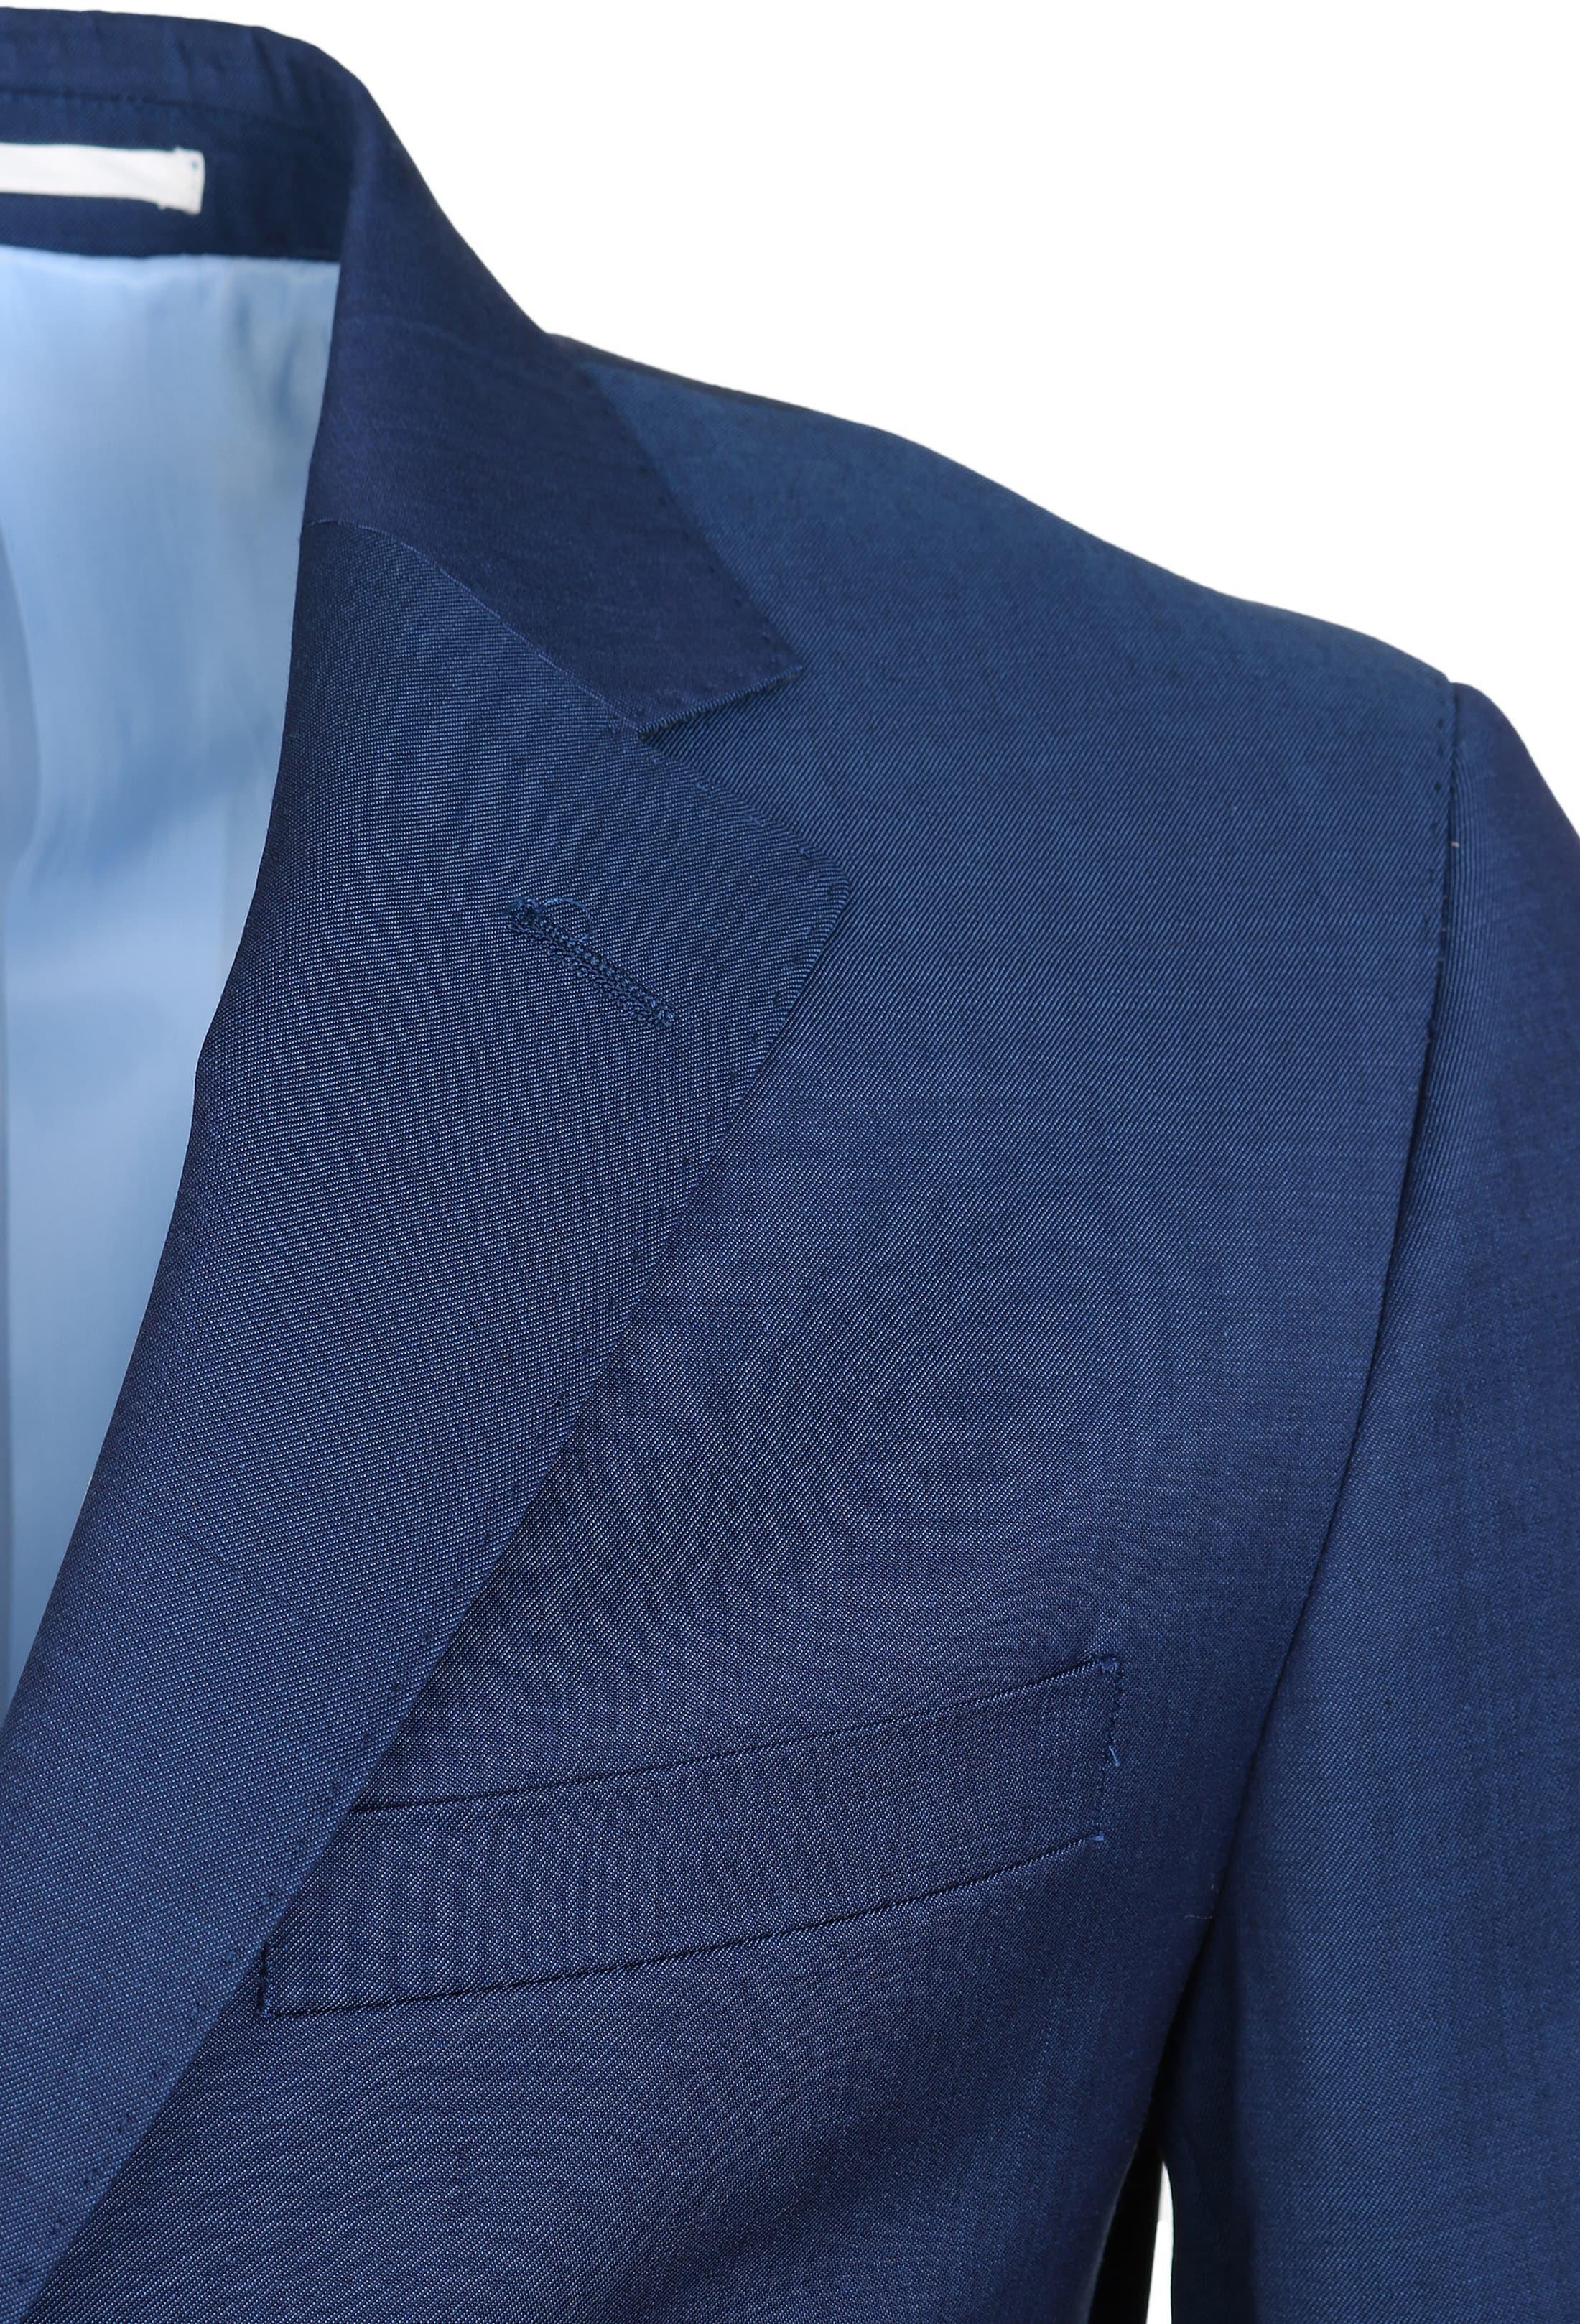 Suitable Anzug Strato Hellblau Navy foto 3